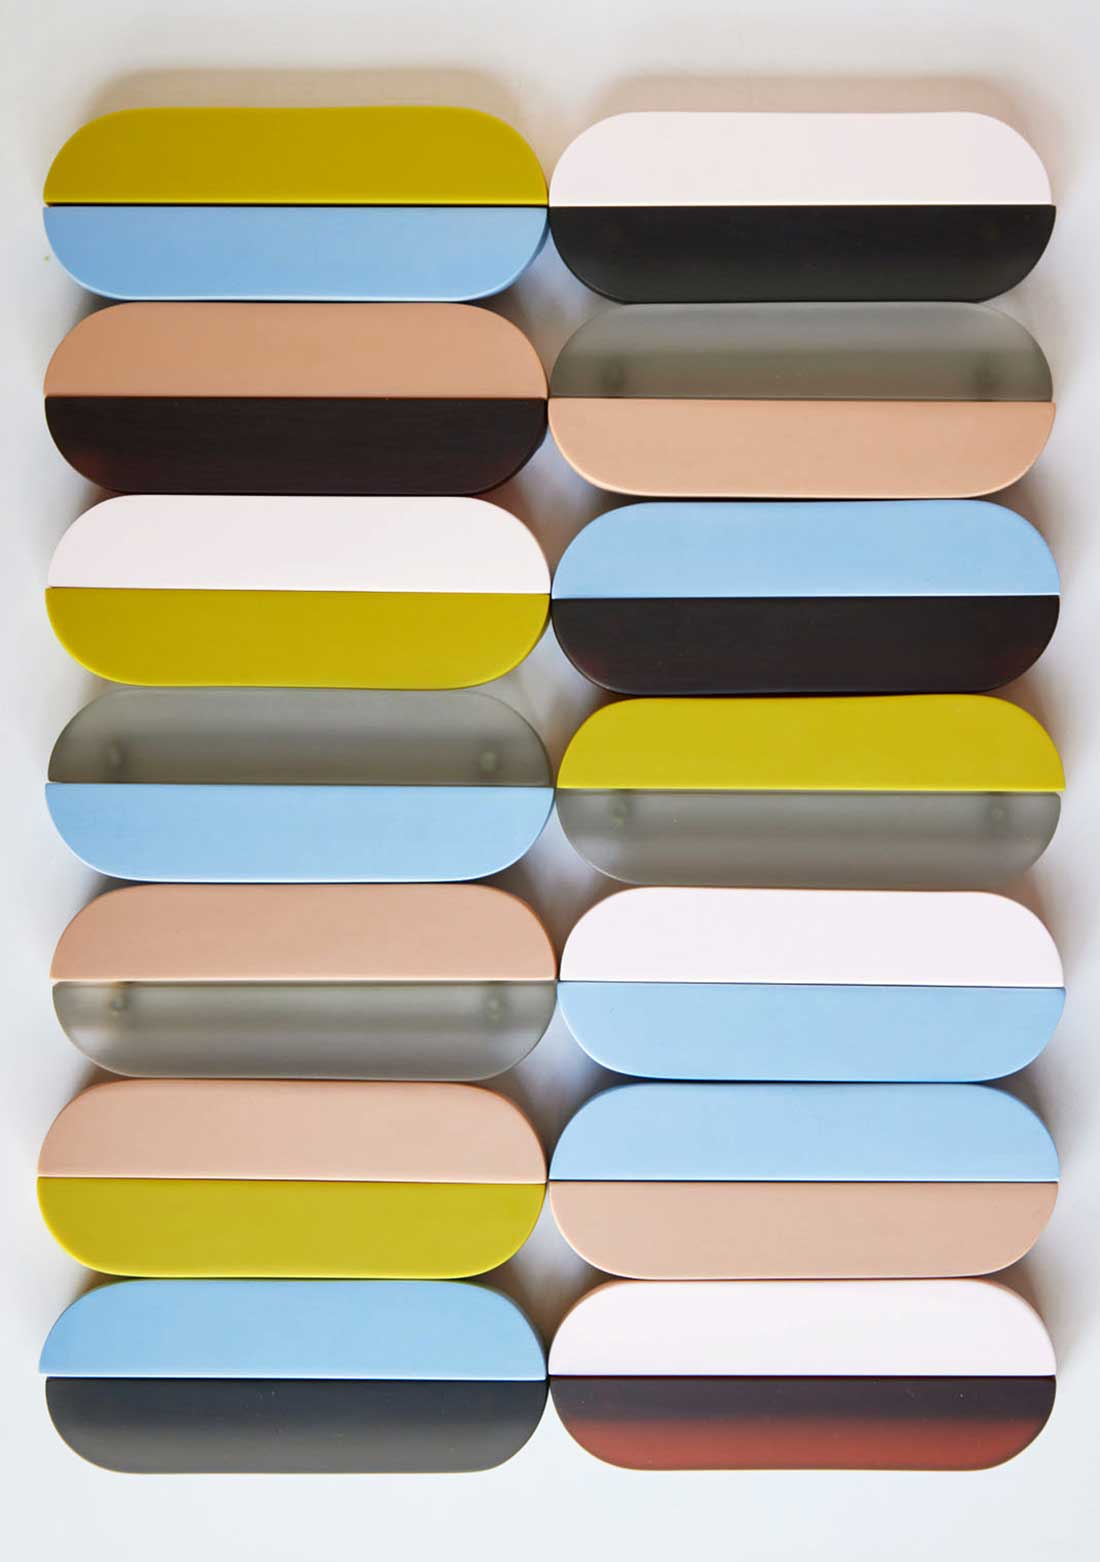 Tina Frey - art objects organized in 2 columns